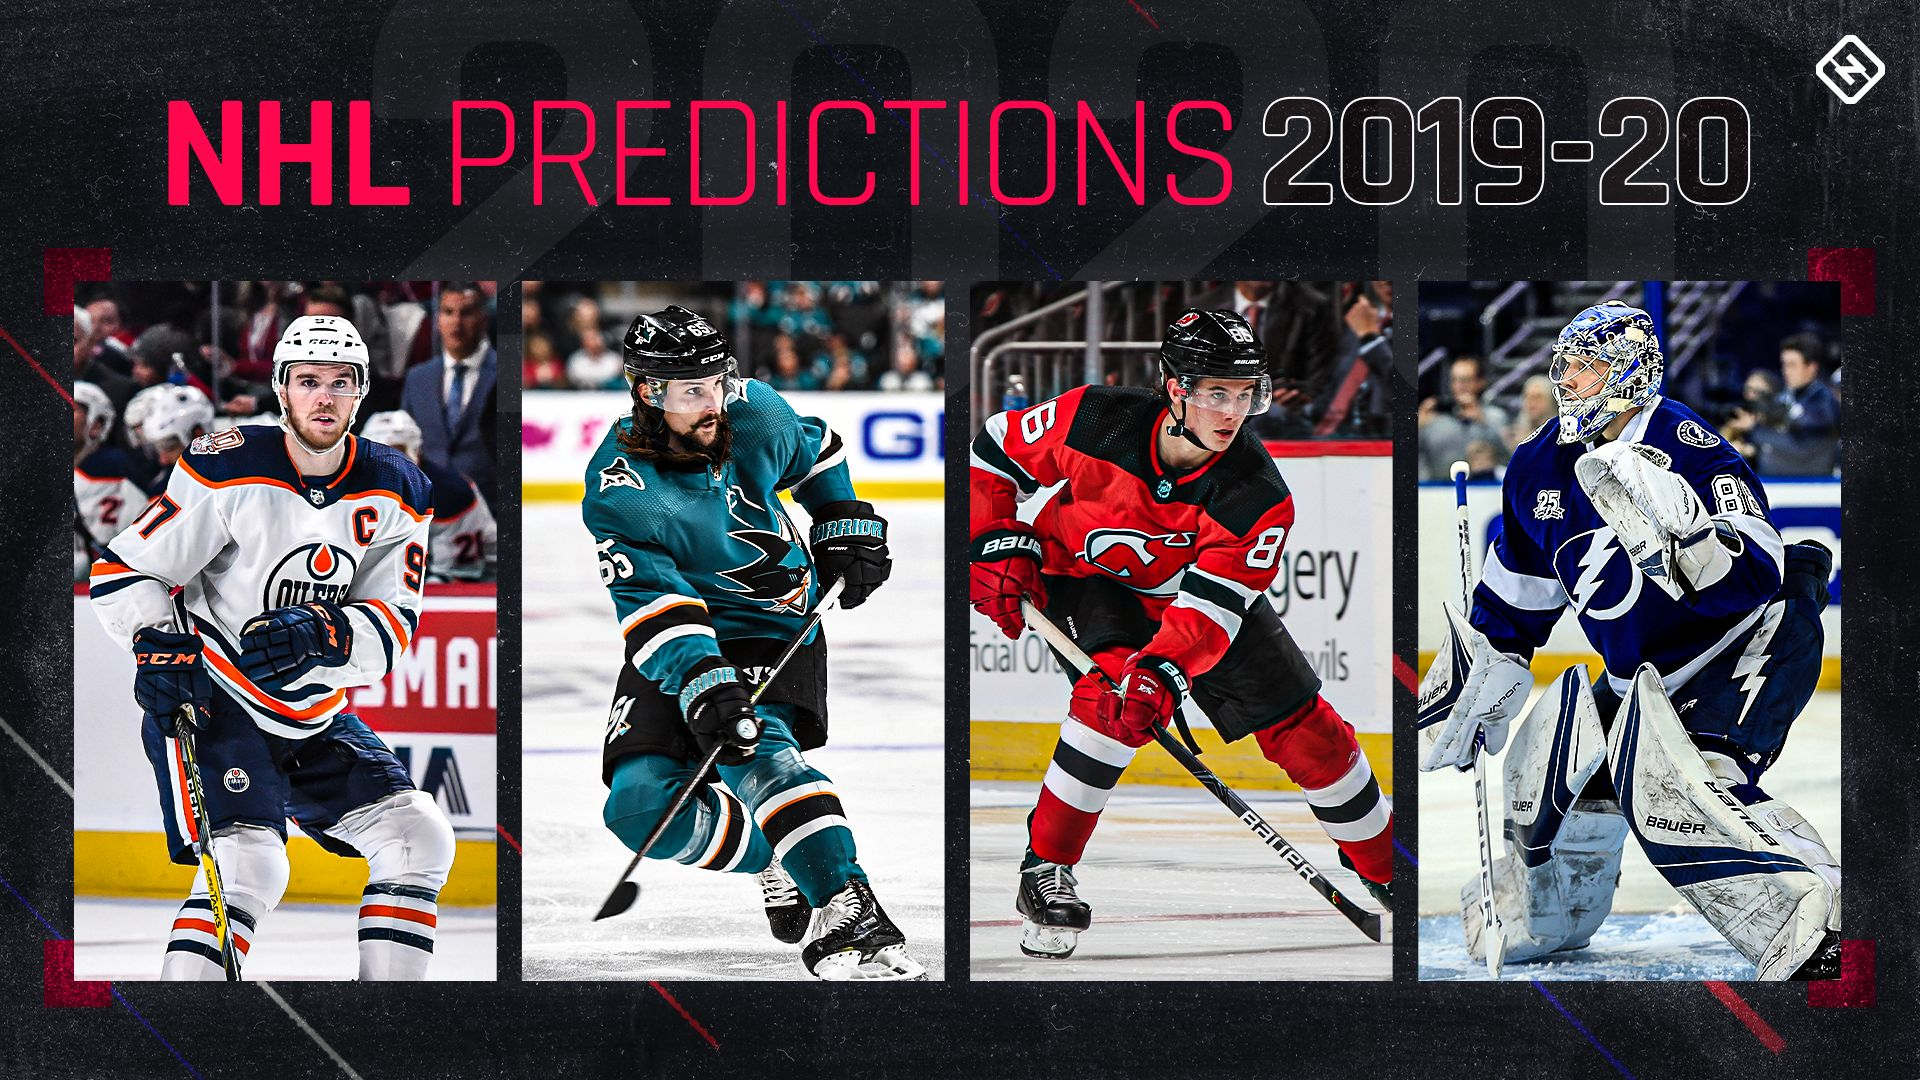 nhl-predictions-2019-20.jpg (464.71 Kb)